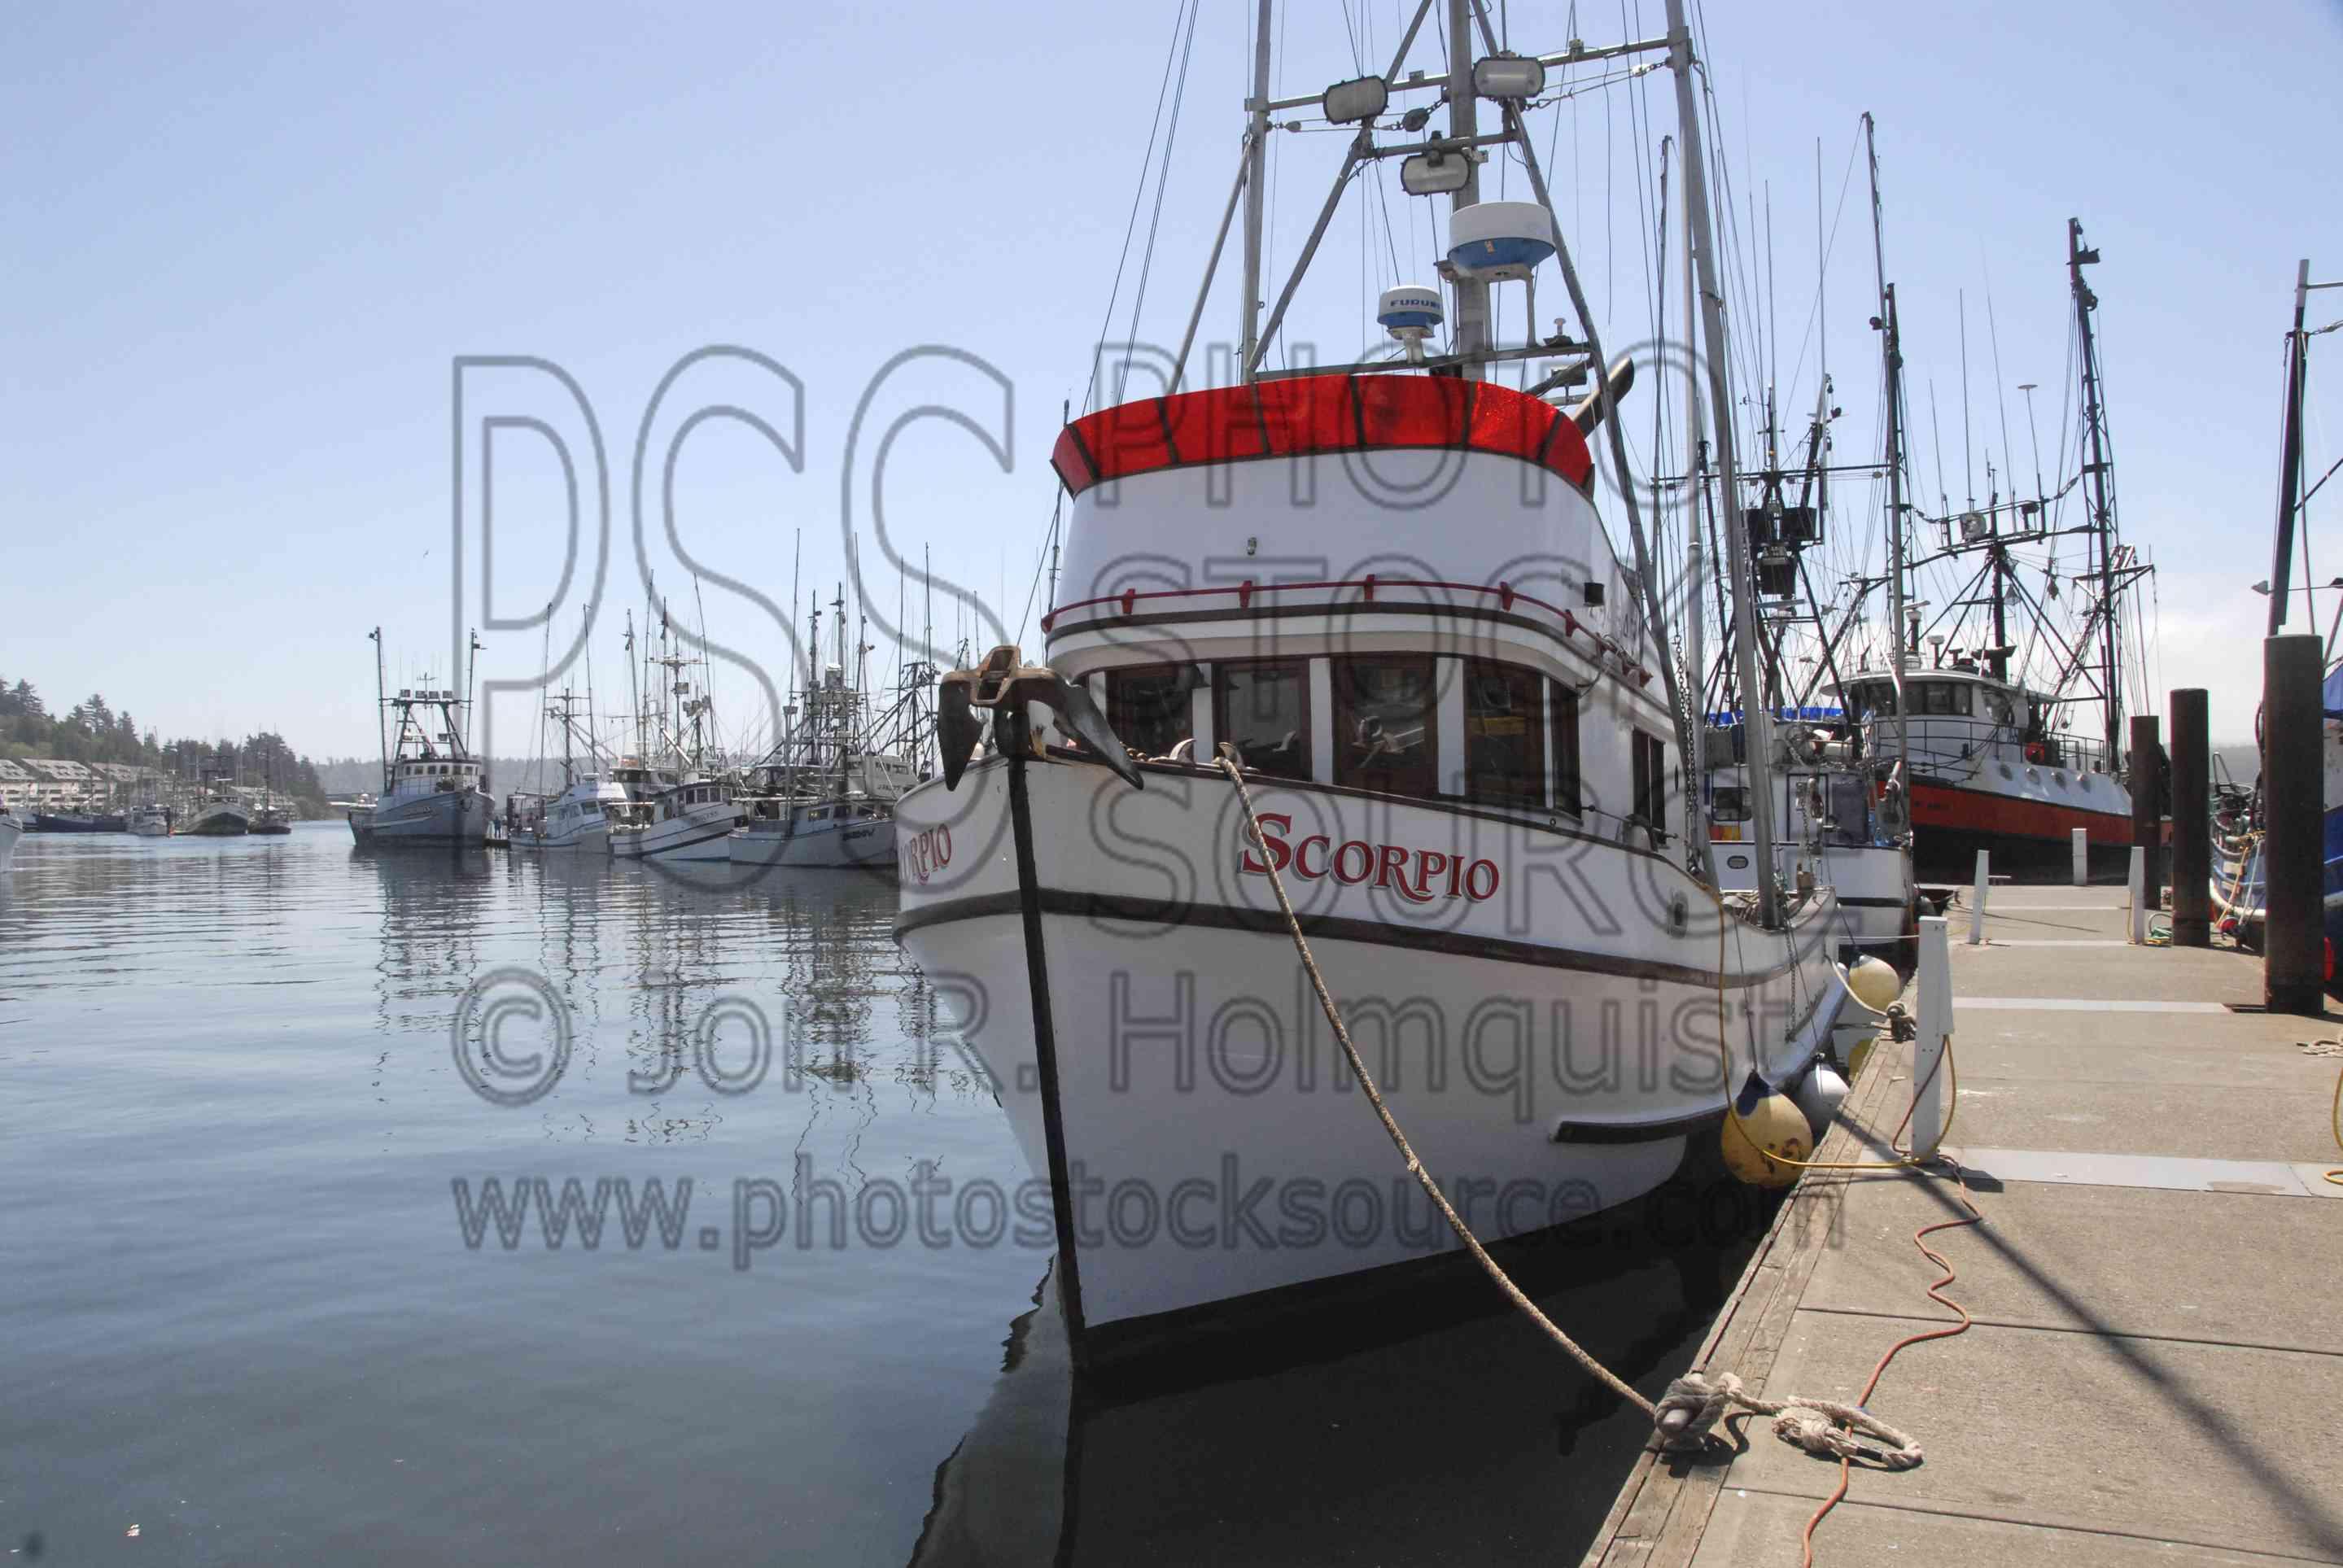 Photo of Scorpio Fishing Boat by Photo Stock Source boat, Newport ...